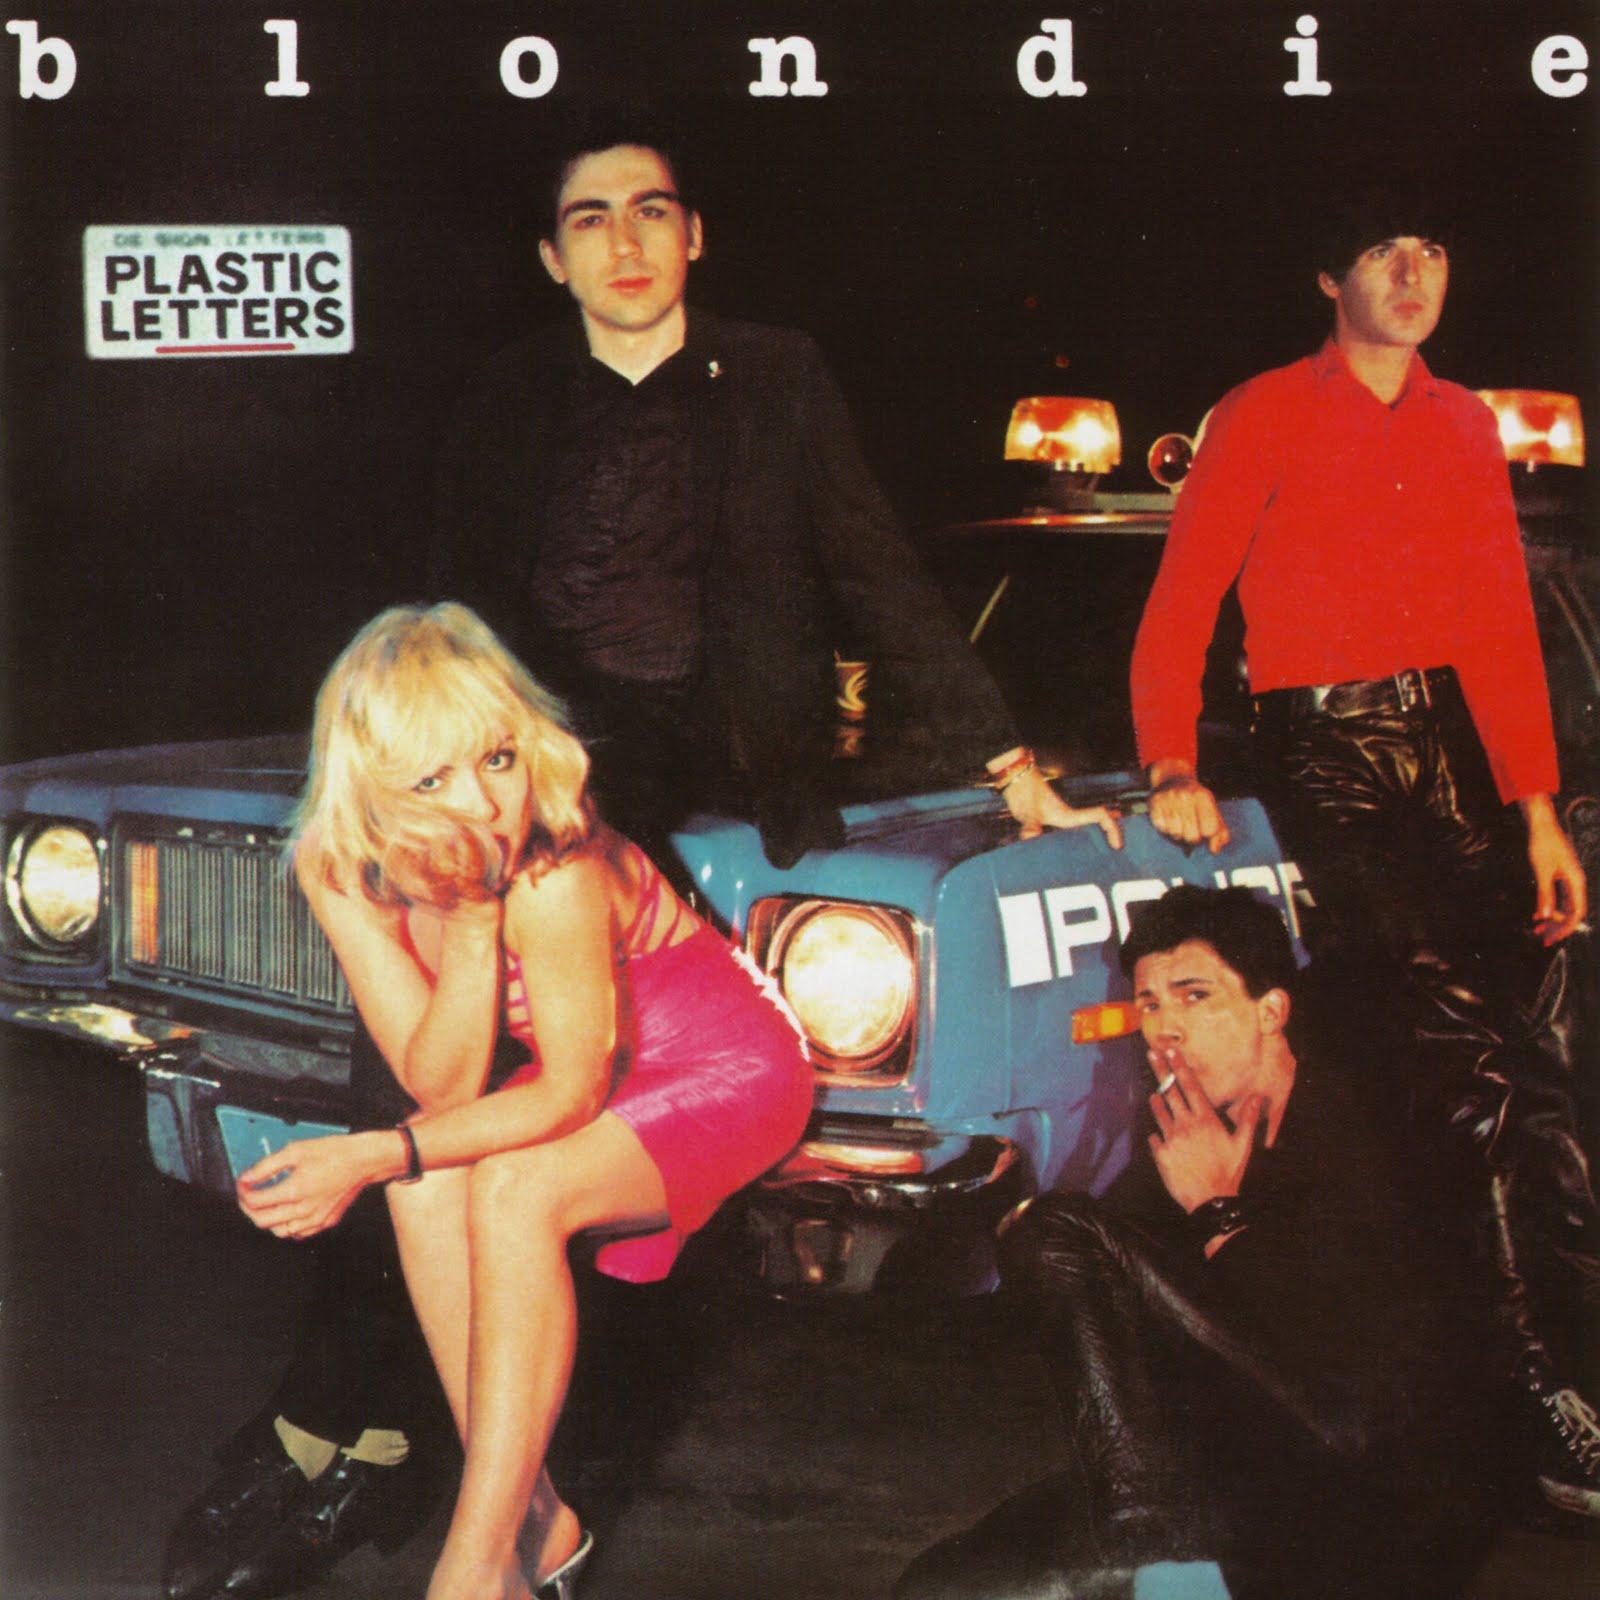 Rockrosters - B: Blondie [1977] Plastic Letters